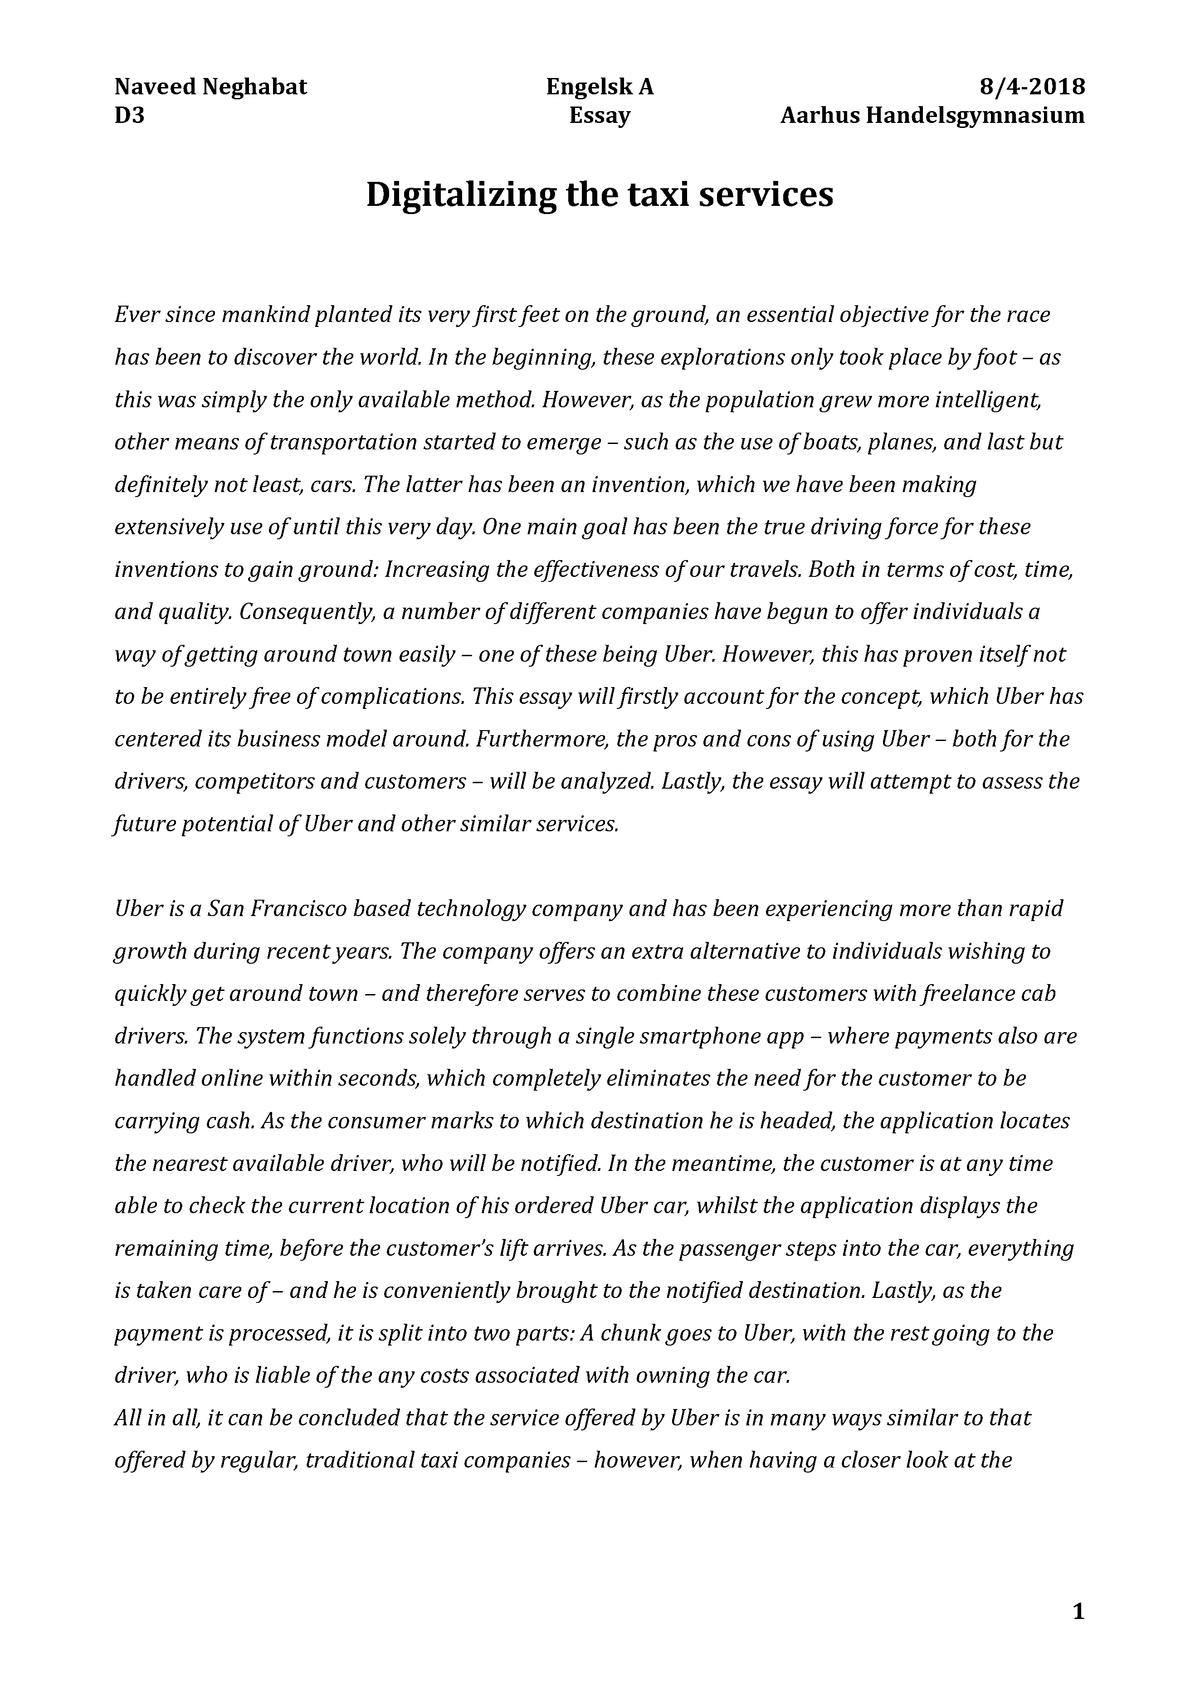 Help desk essay dissertations service